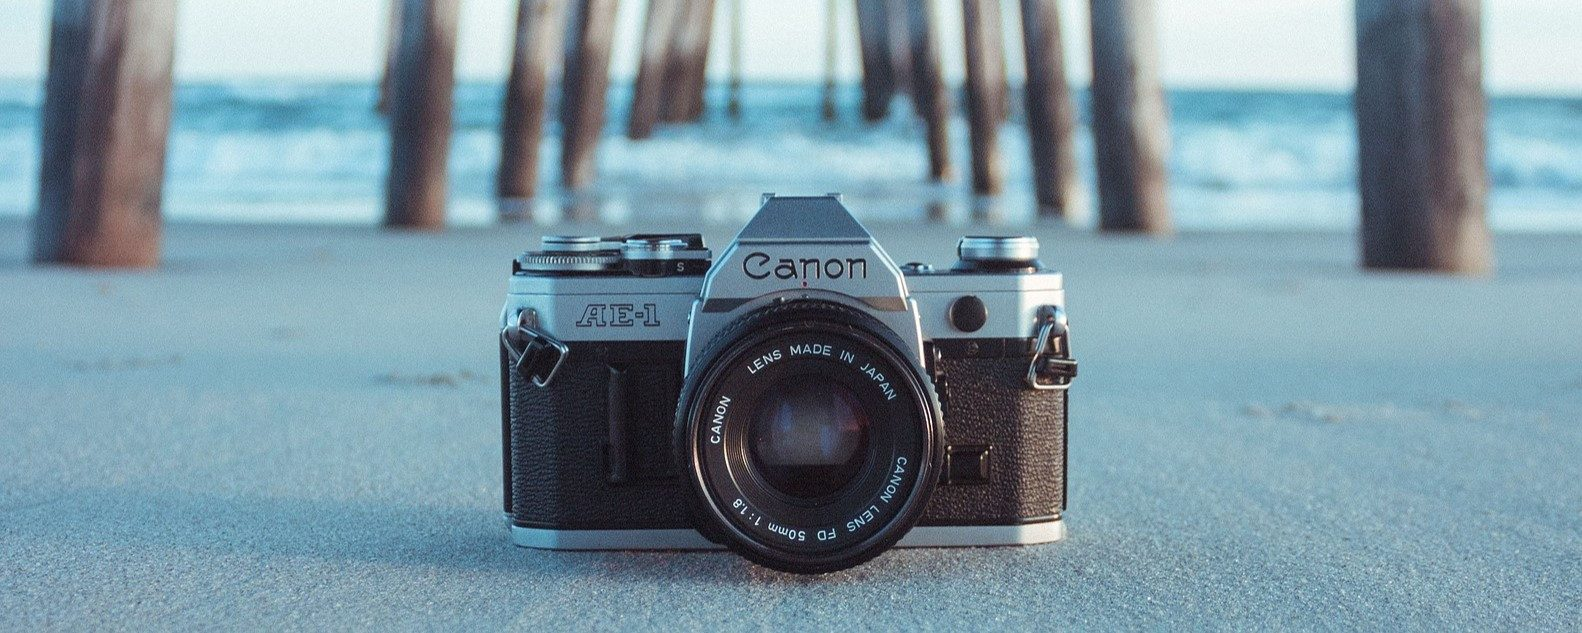 Protéger son appareil photo à la plage ou en bateau Picksea - SAS Nauting